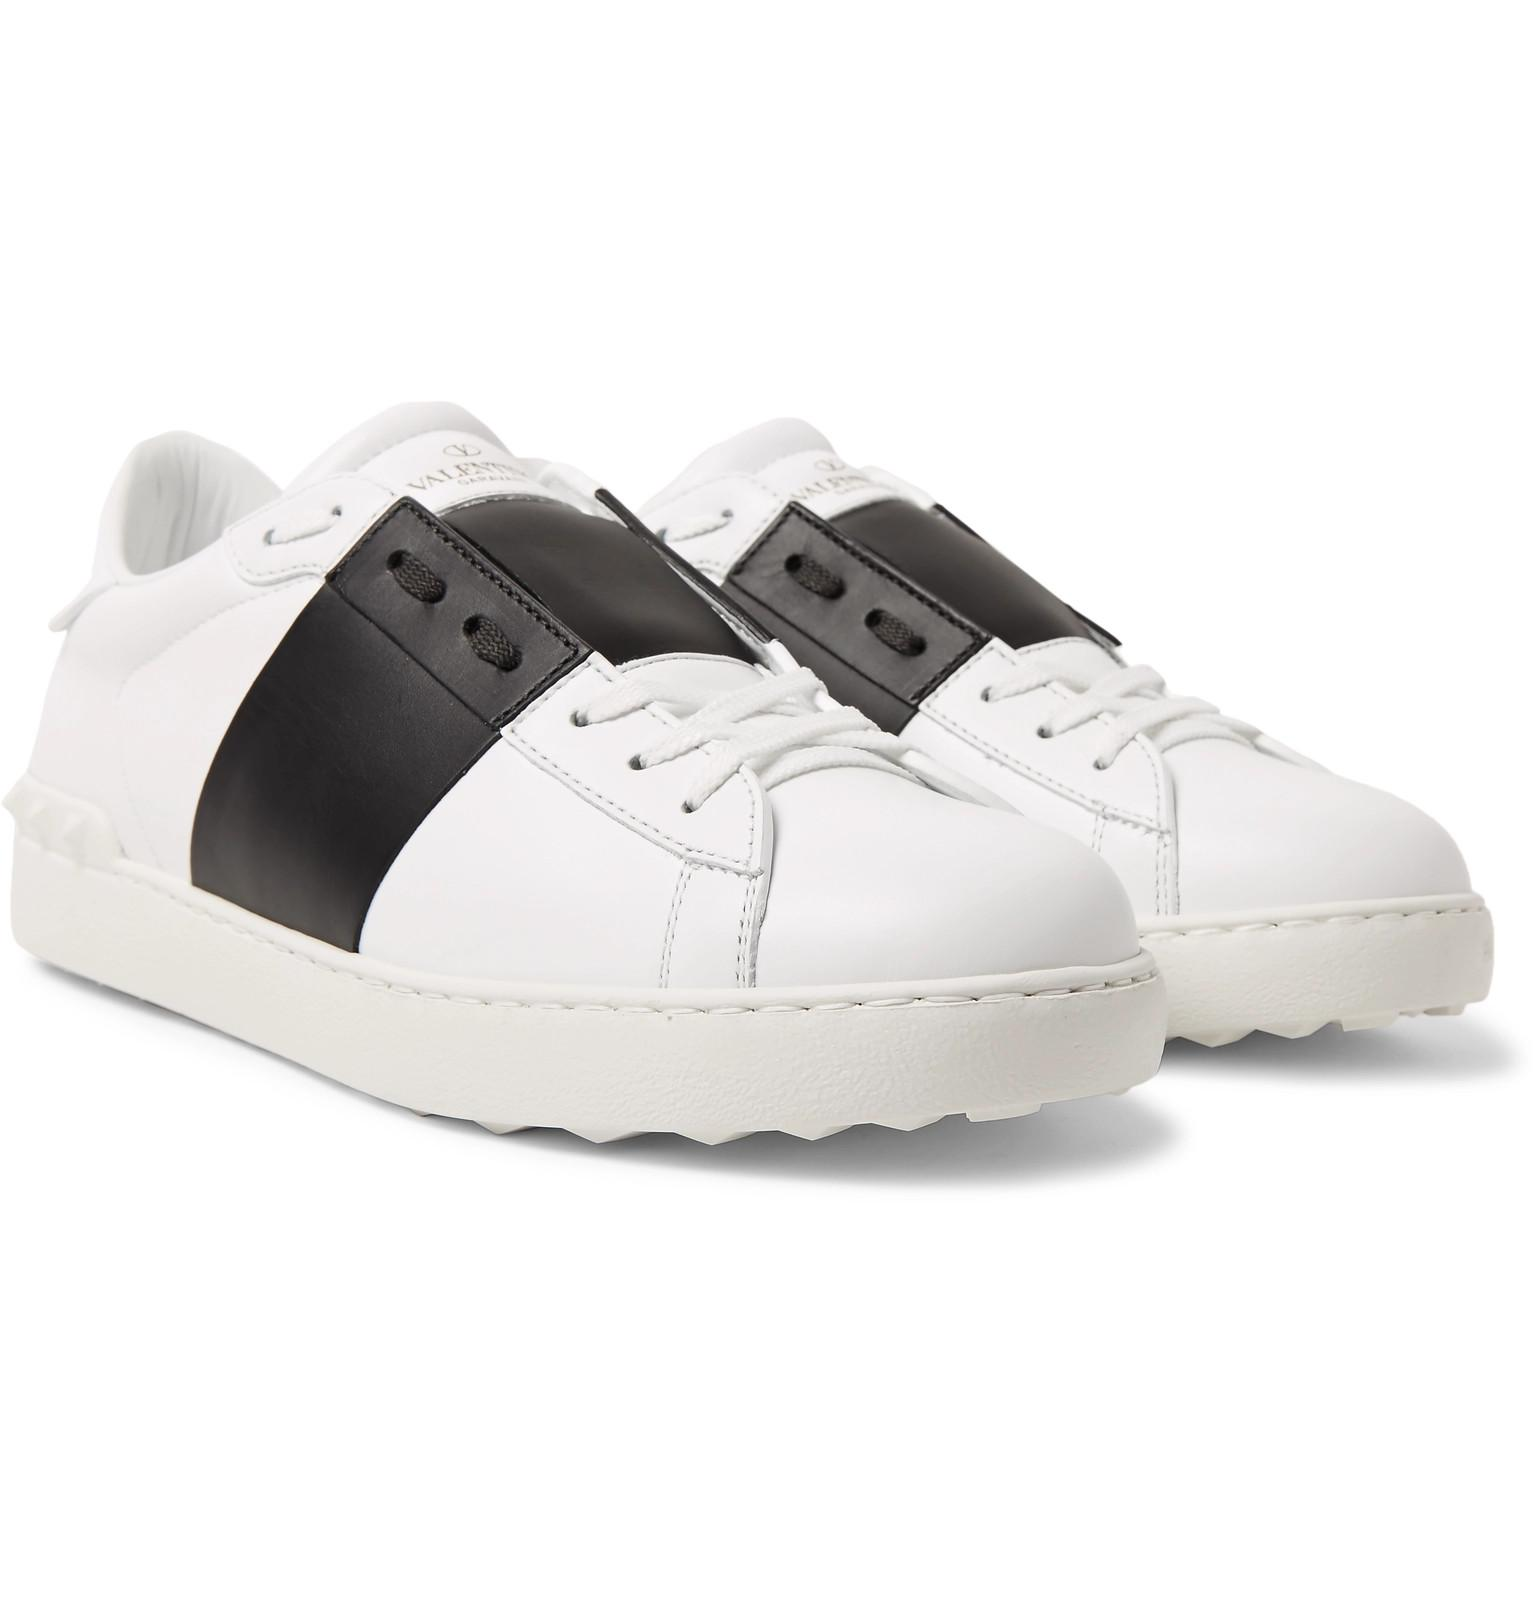 Cuir Rayé Garavani Ouvert Slip-on Chaussures Valentino 5524a0Z